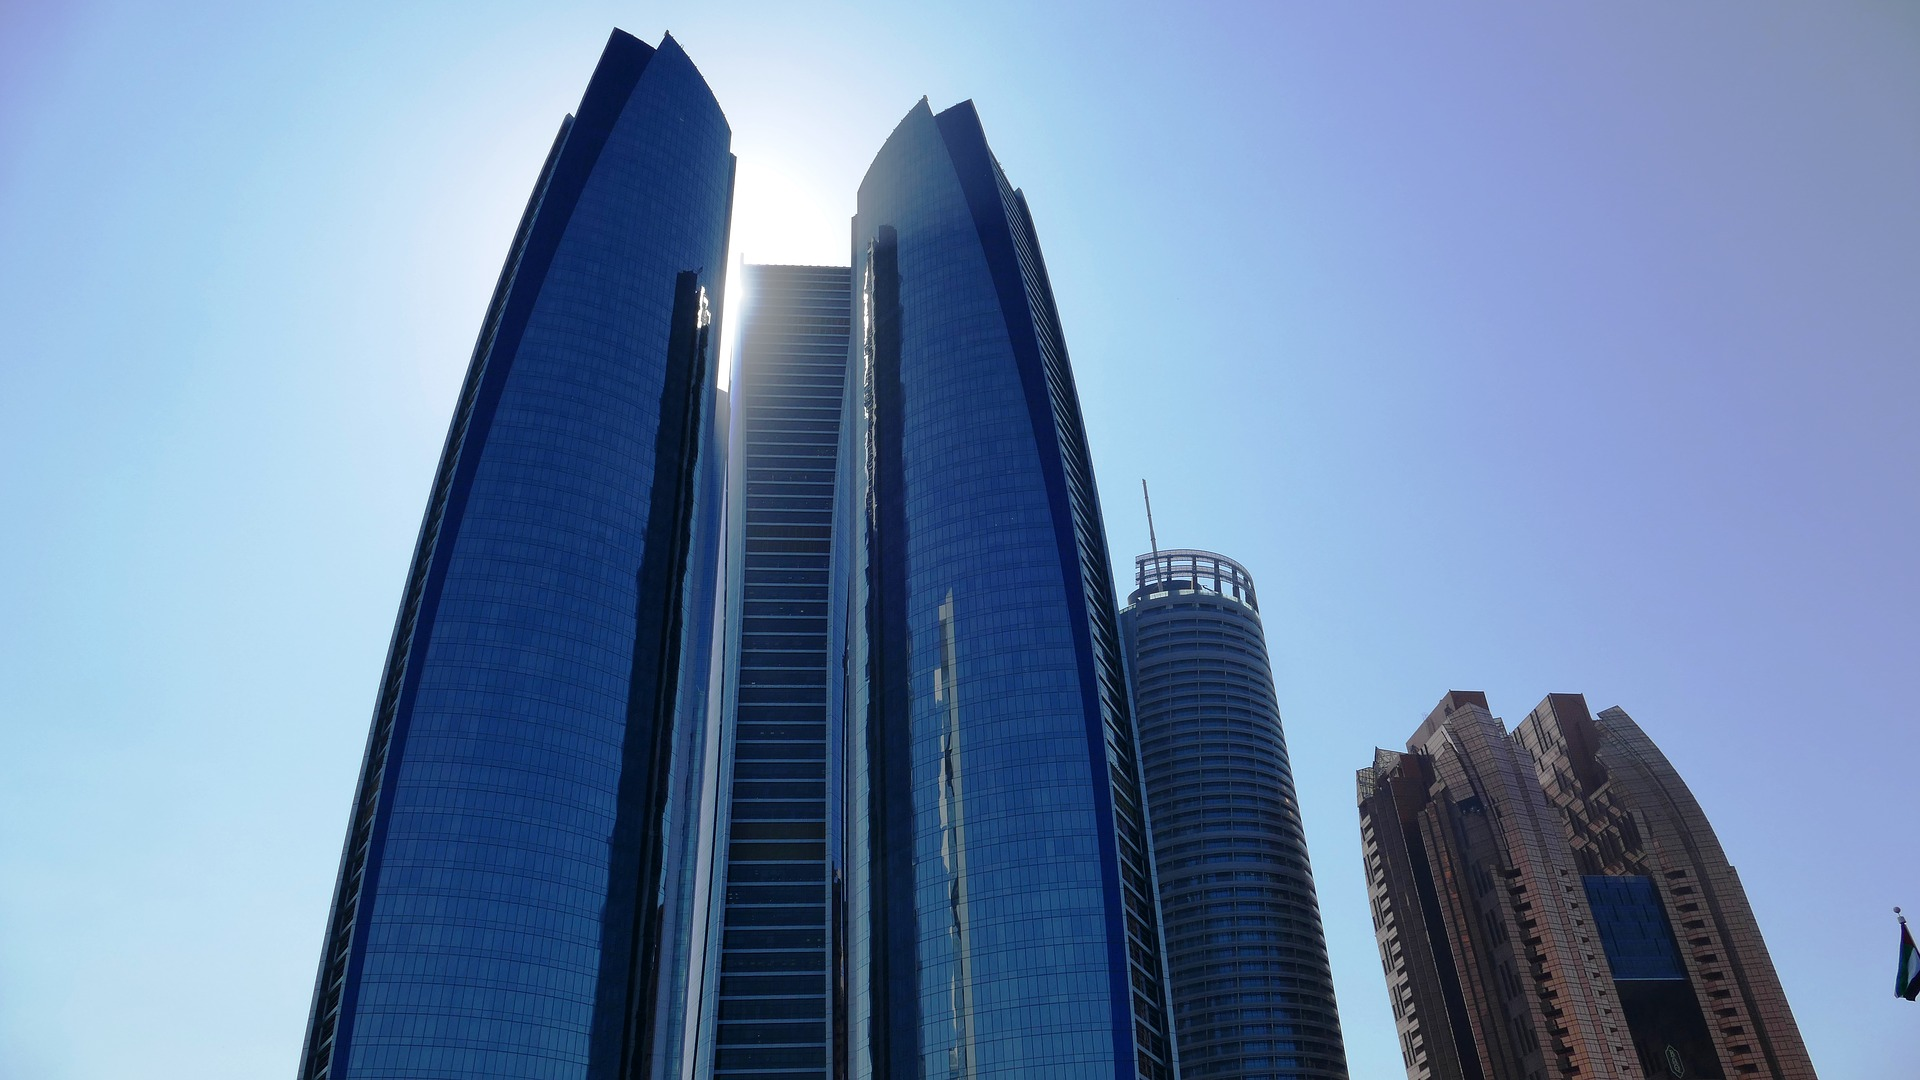 Pixabay – Abu Dhabi